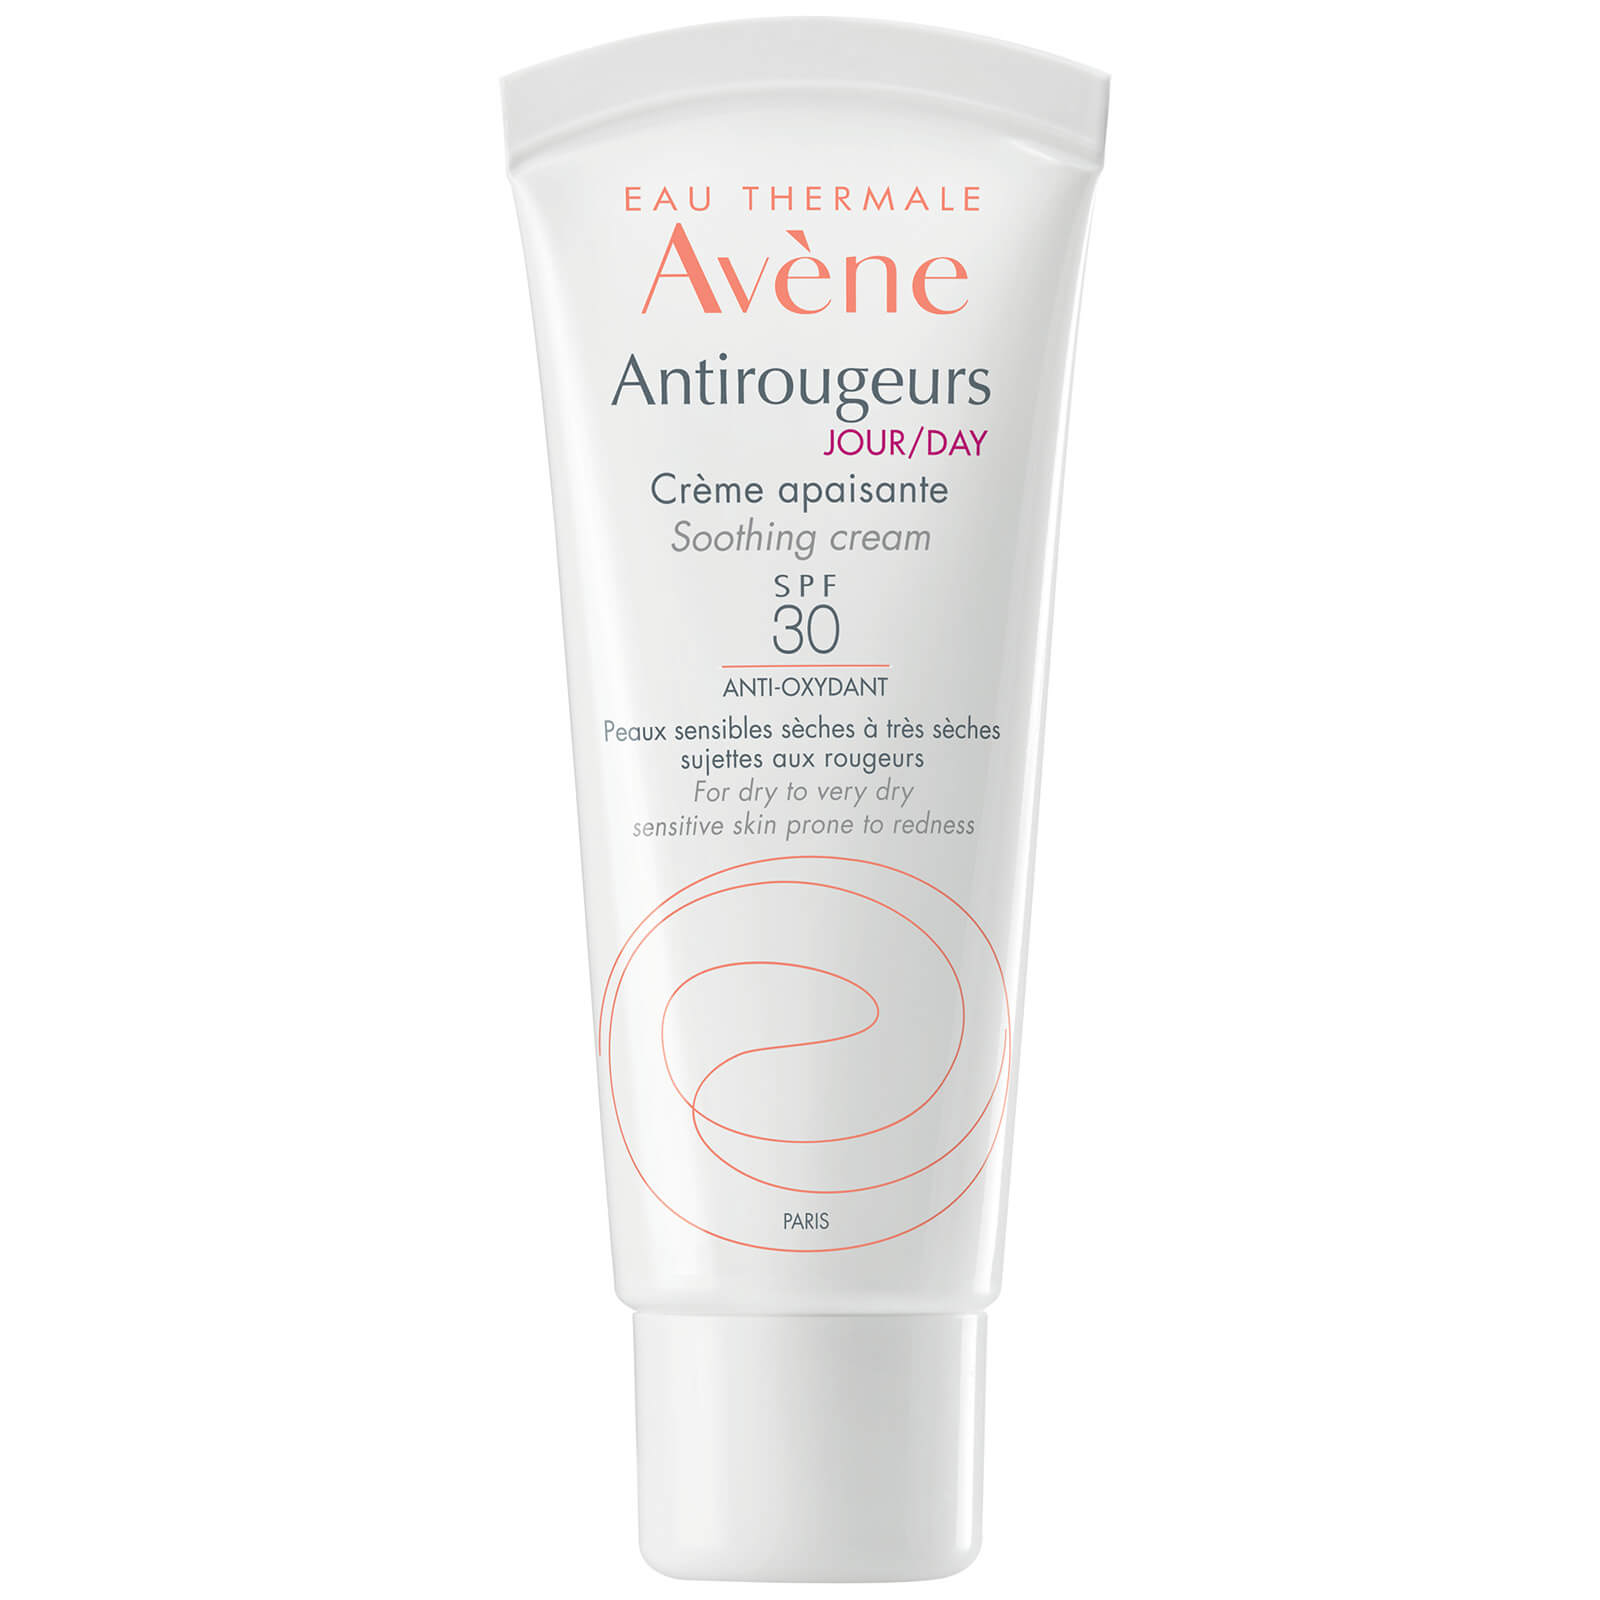 Avène Antirougeurs Day Cream SPF30 Moisturiser for Skin Prone to Redness 40ml